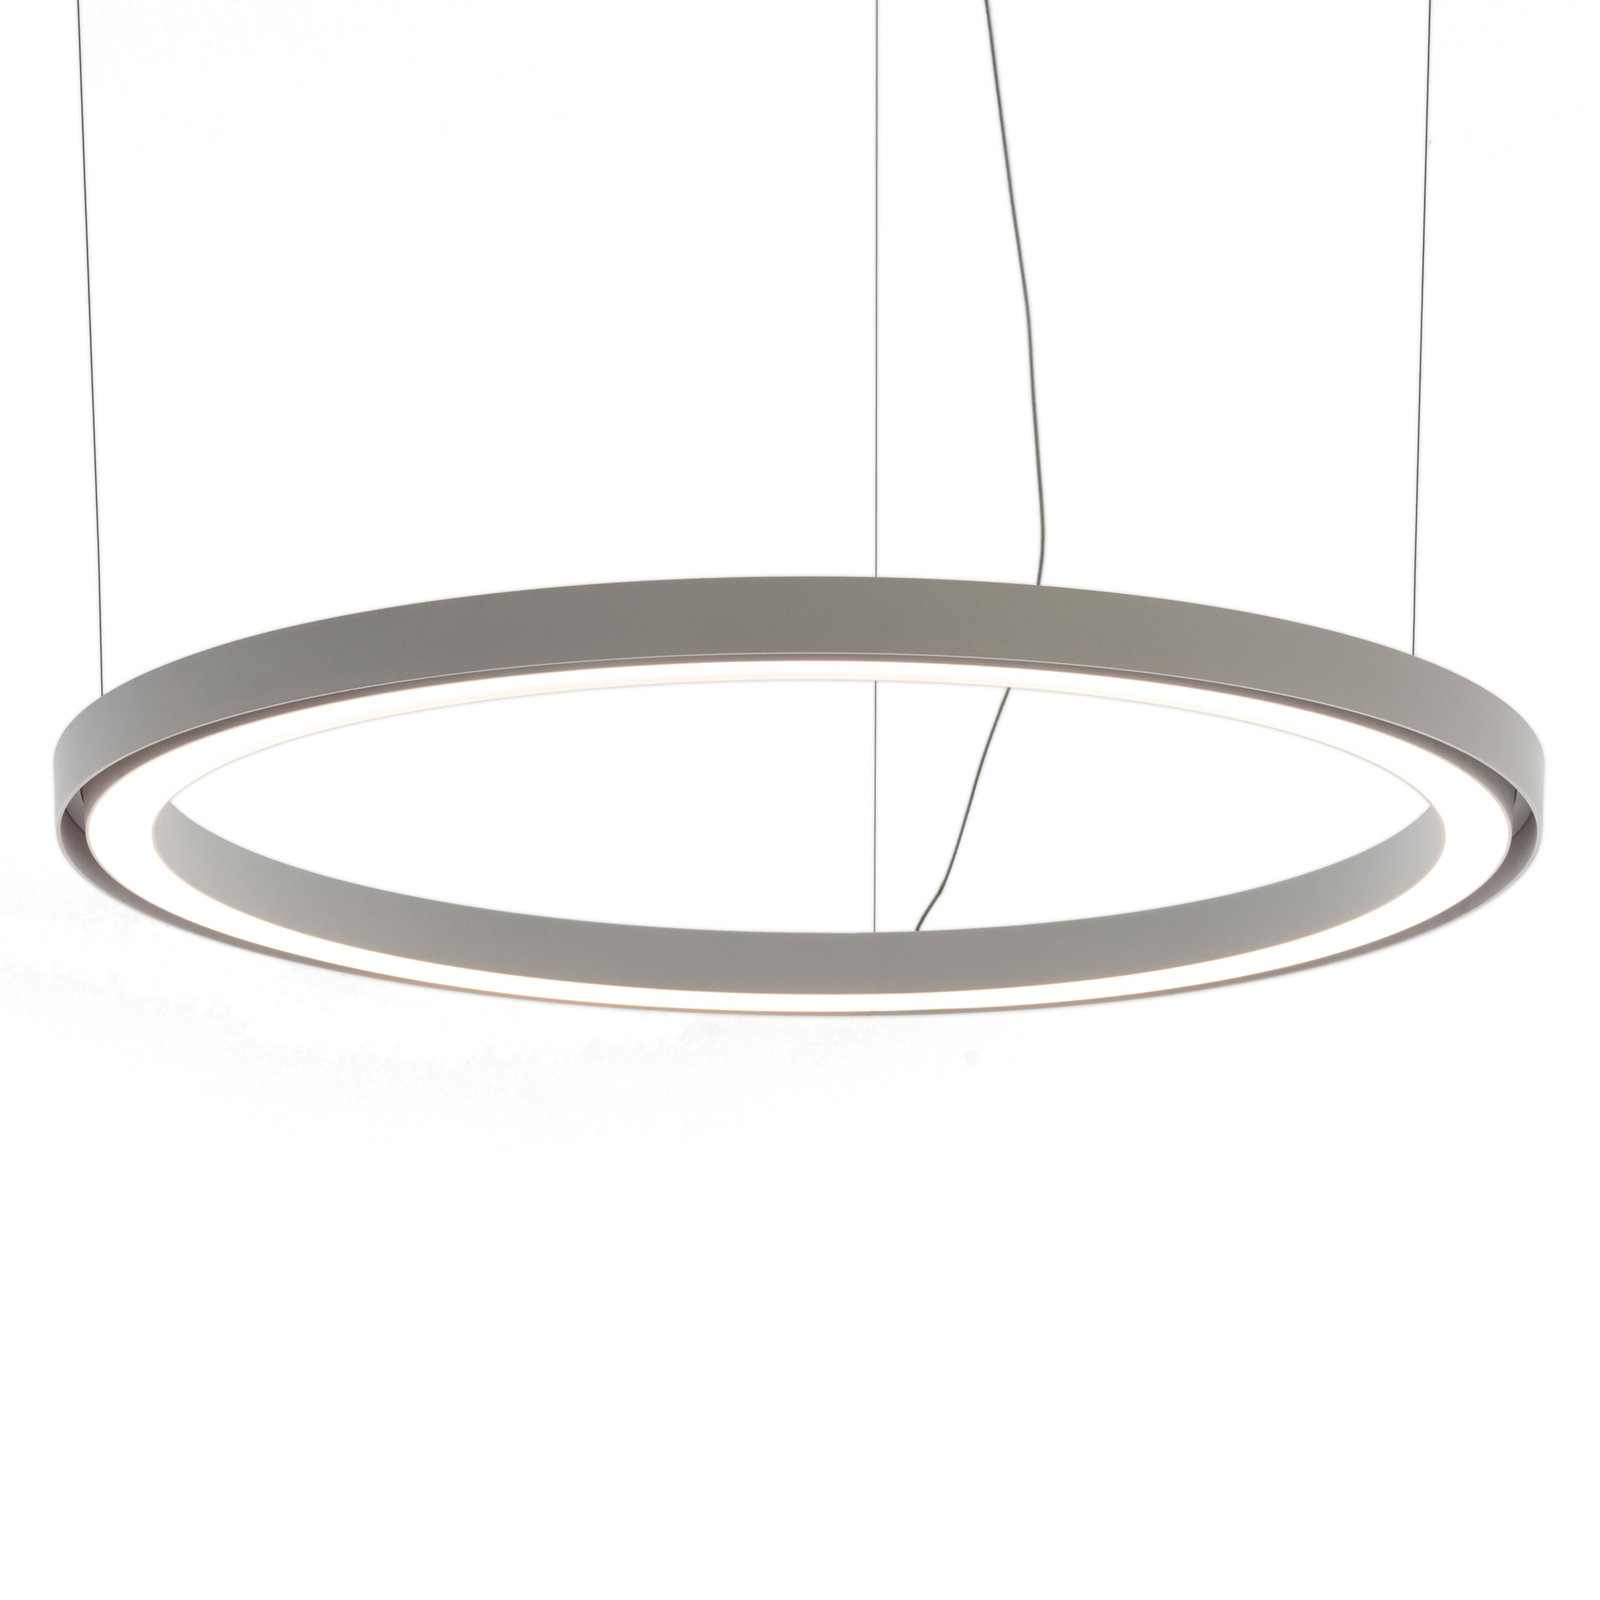 Artemide Ripple LED-Hängelampe App steuerbar Ø90cm